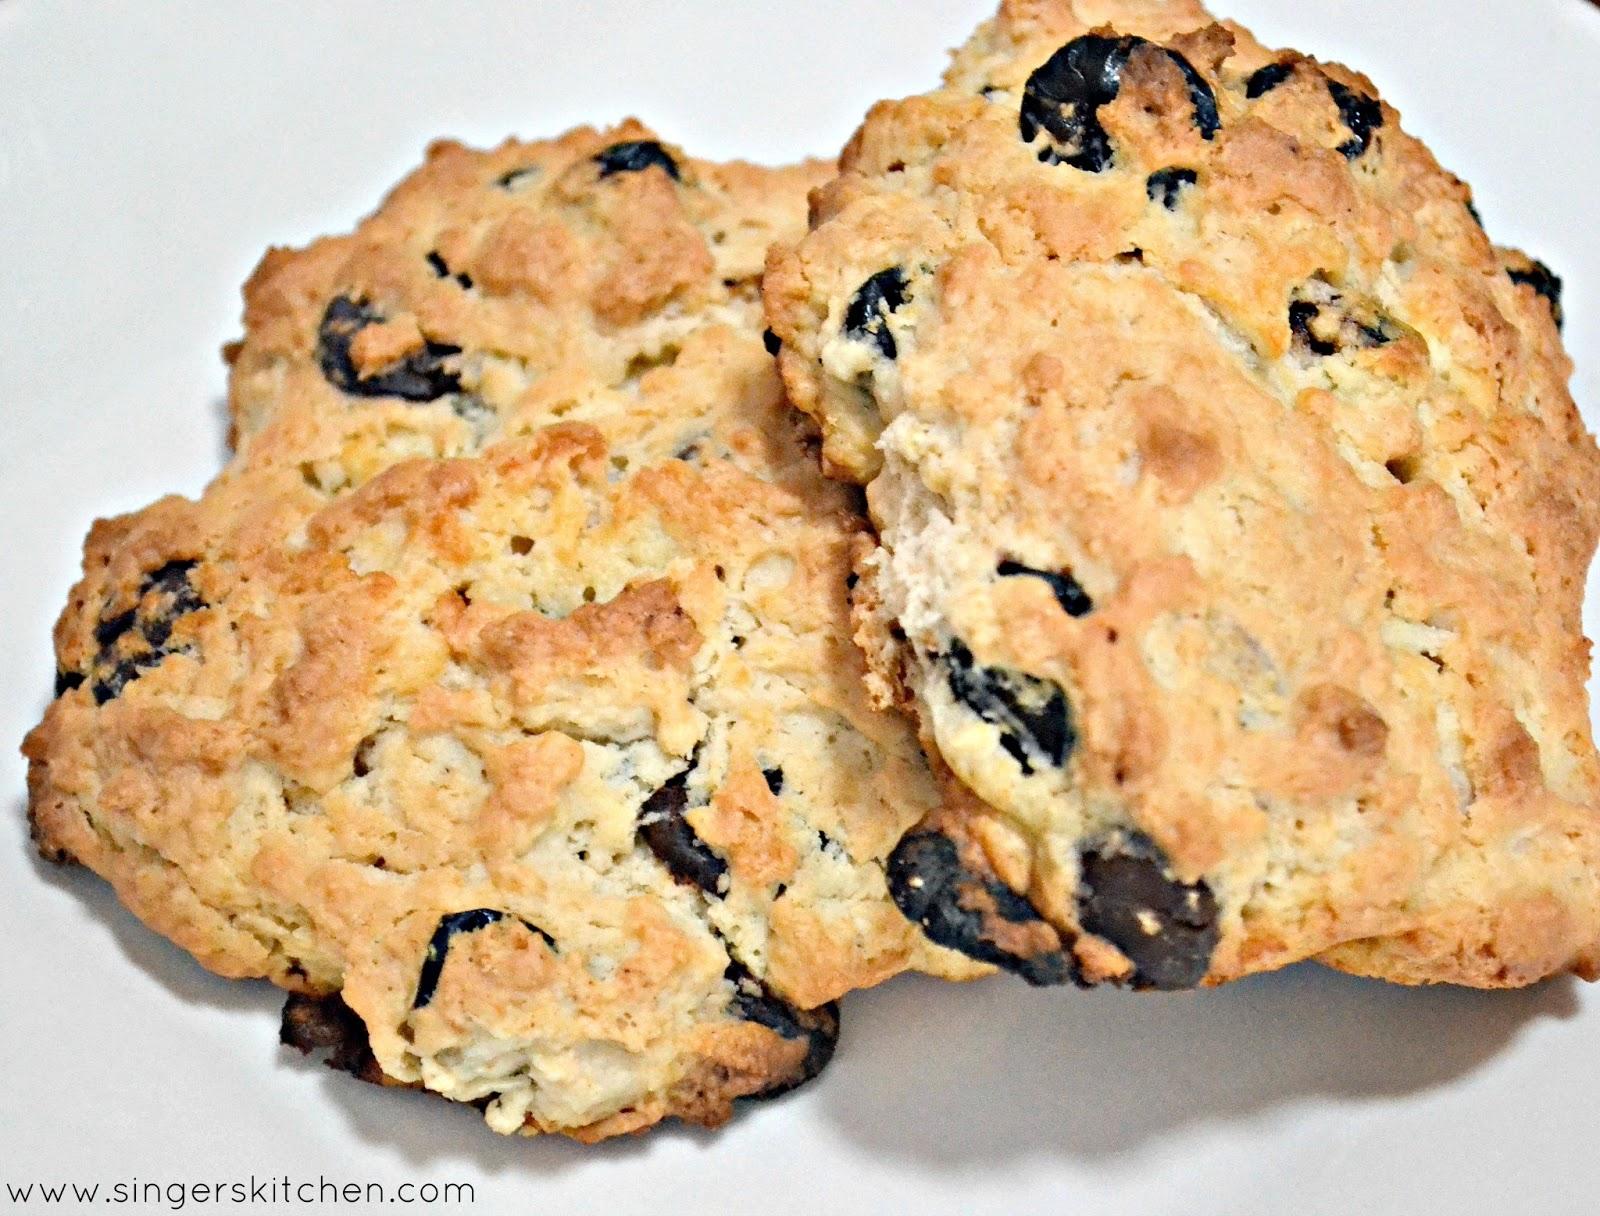 made some delicious scones using the Original Coconut Milk Creamer ...